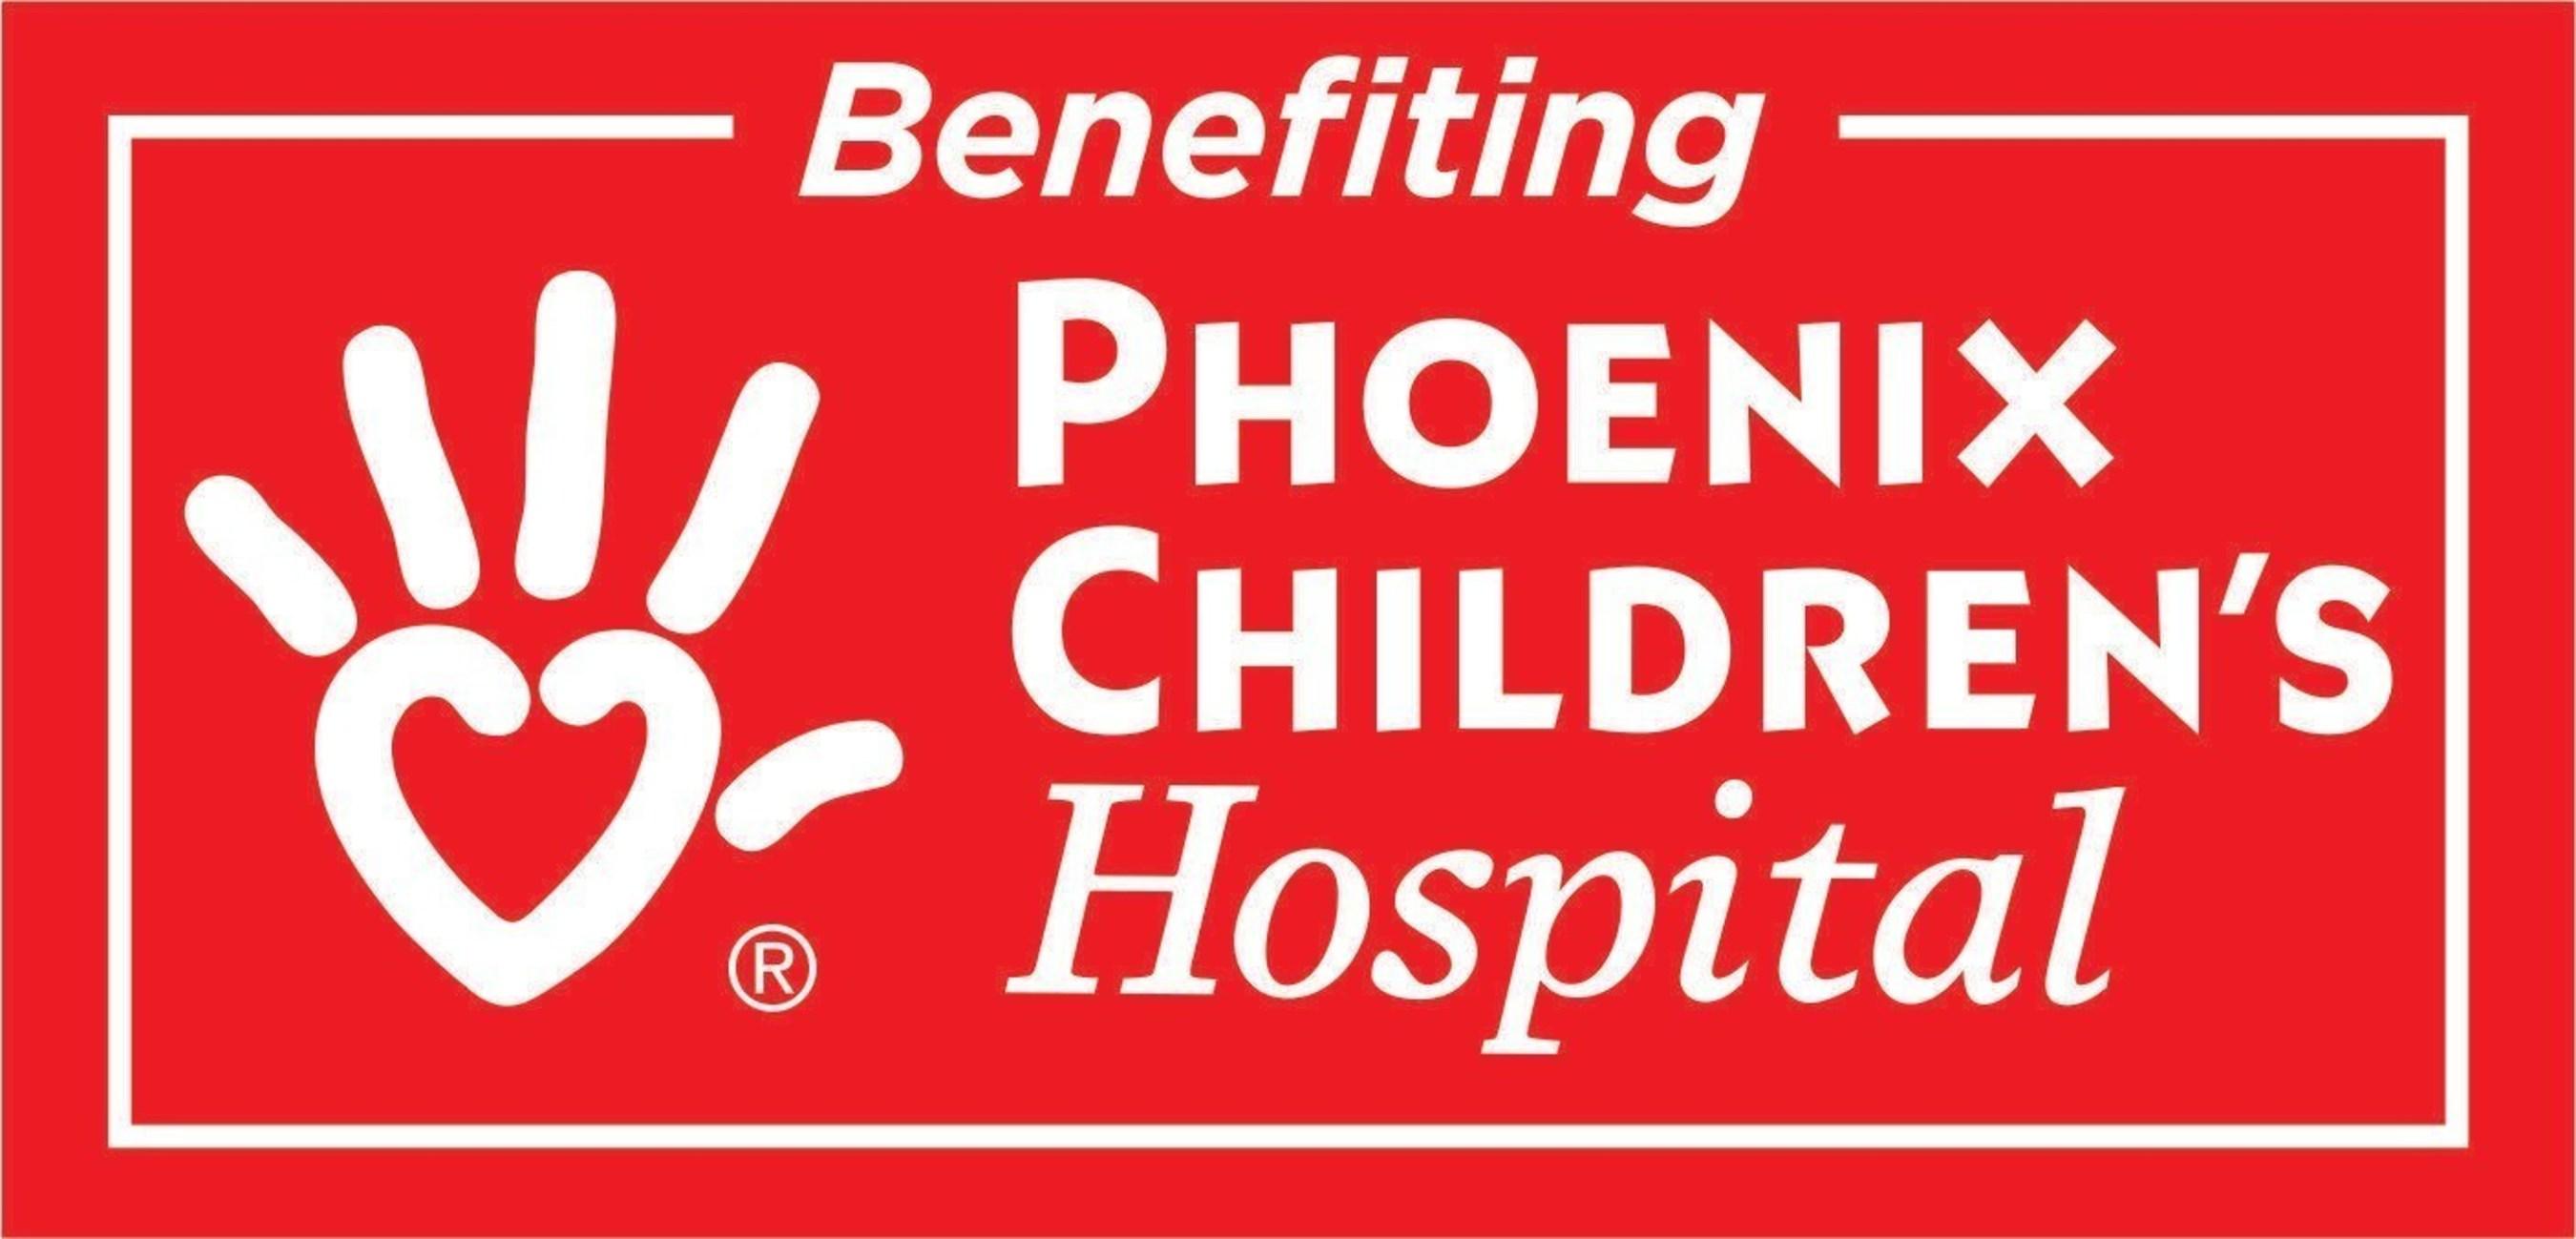 Phoenix Children's Hospital logo.